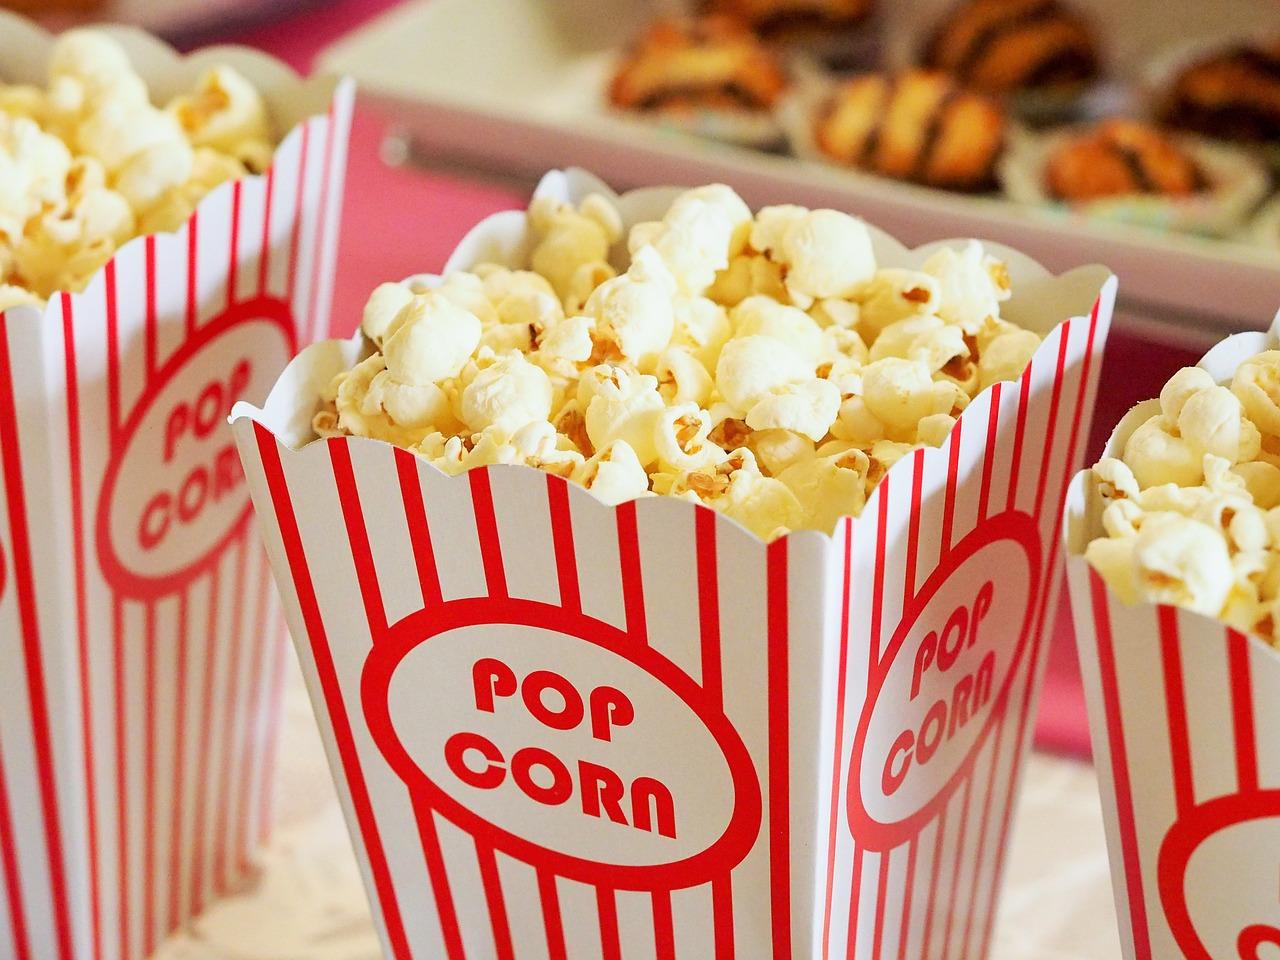 TEDx GUC Popcorn